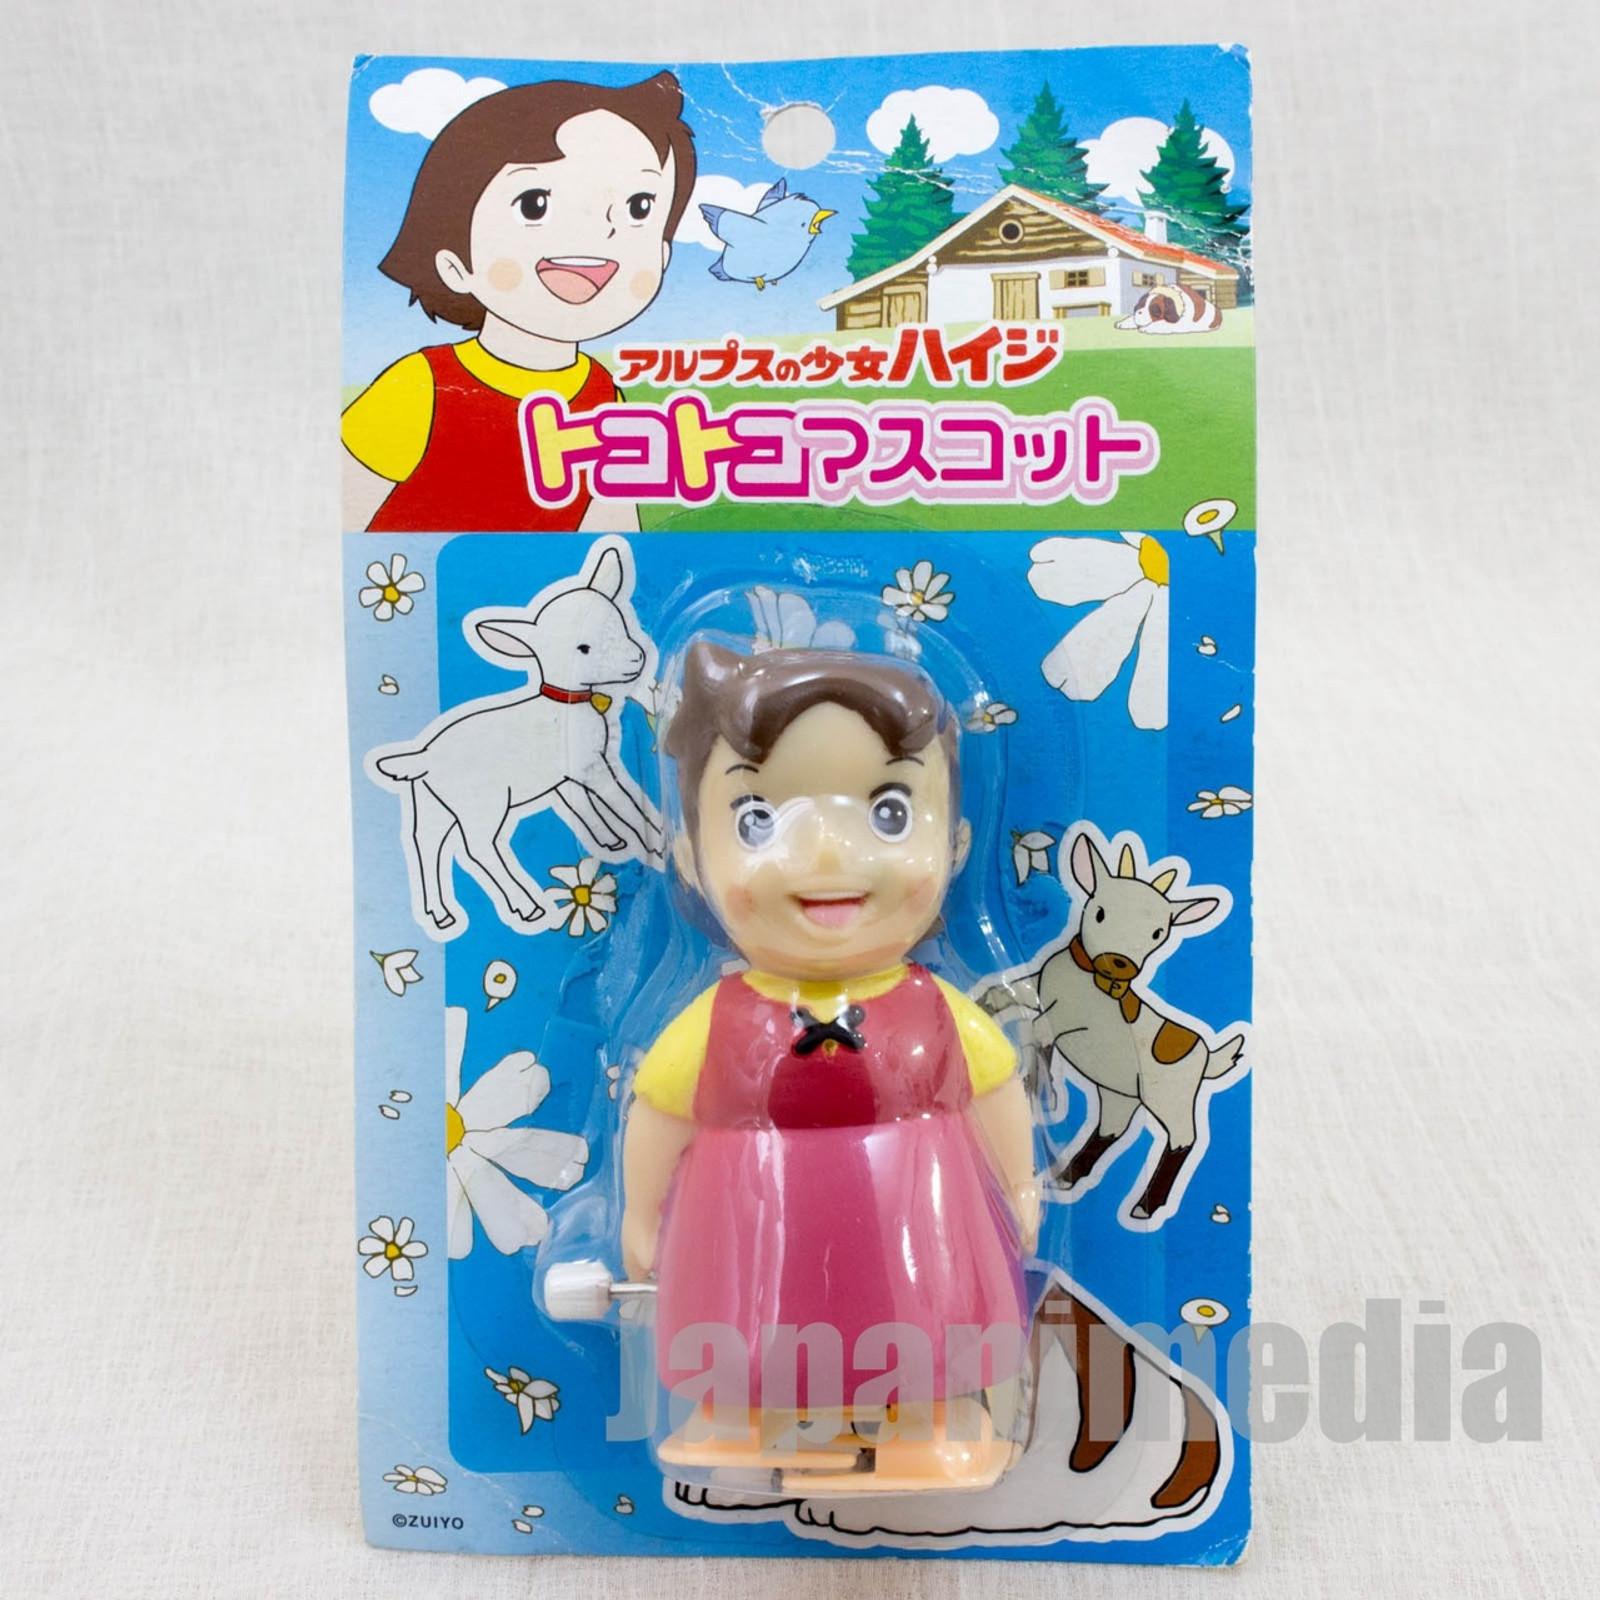 RARE Heidi Girl of the Alps Tokotoko Mascot Wind Up Figure JAPAN ANIME